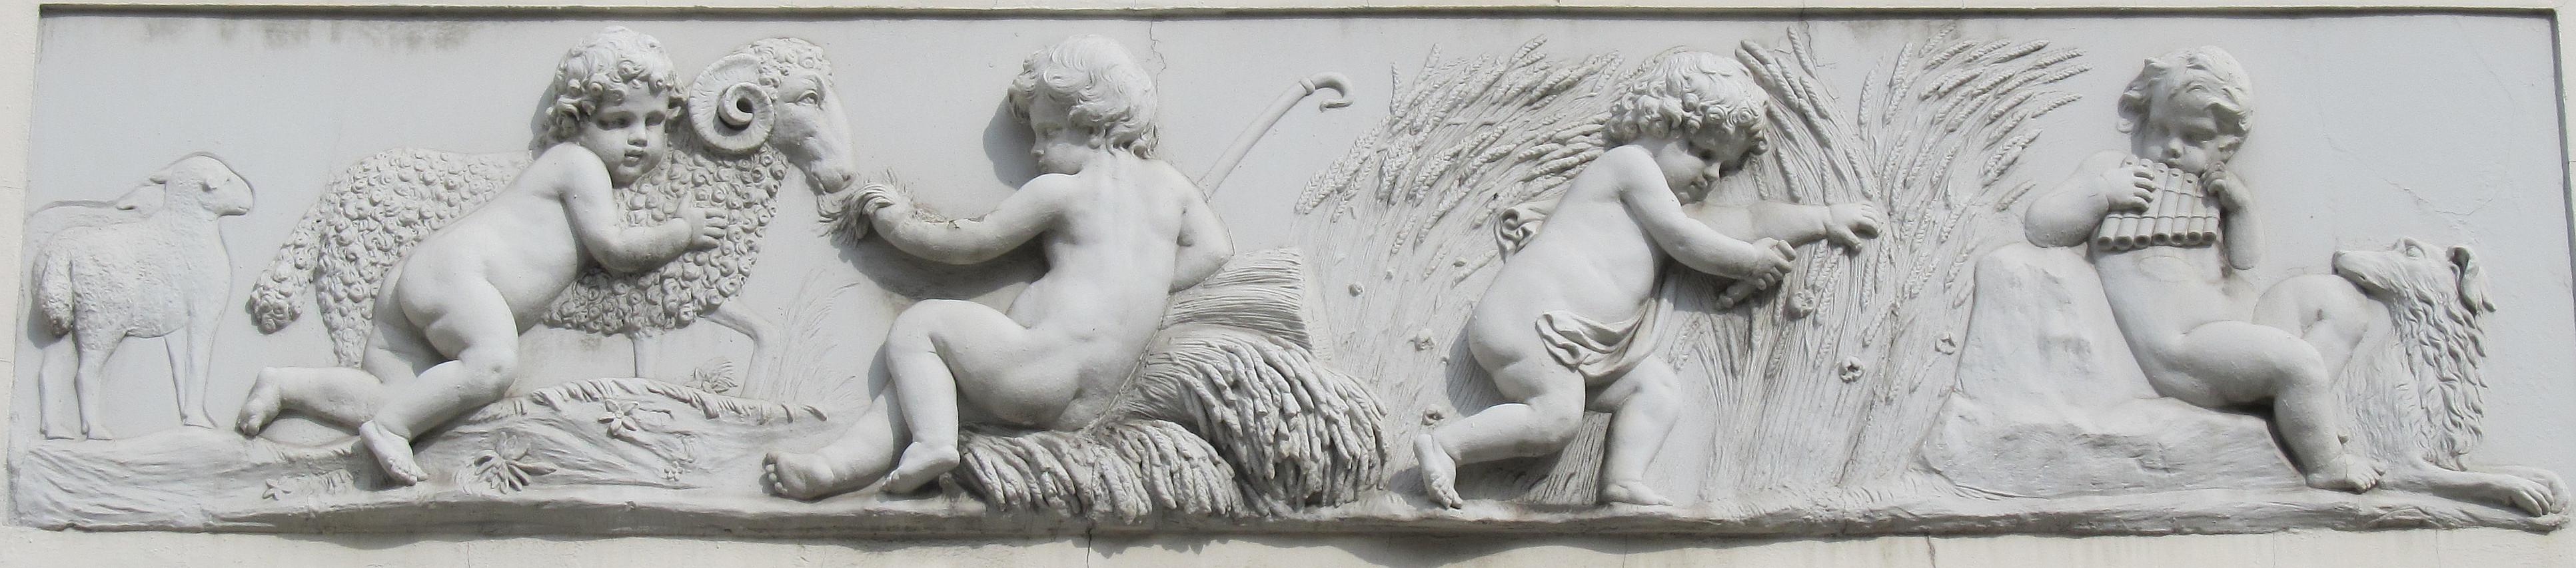 Cherub And Putti Sculpture In Victorian And Edwardian